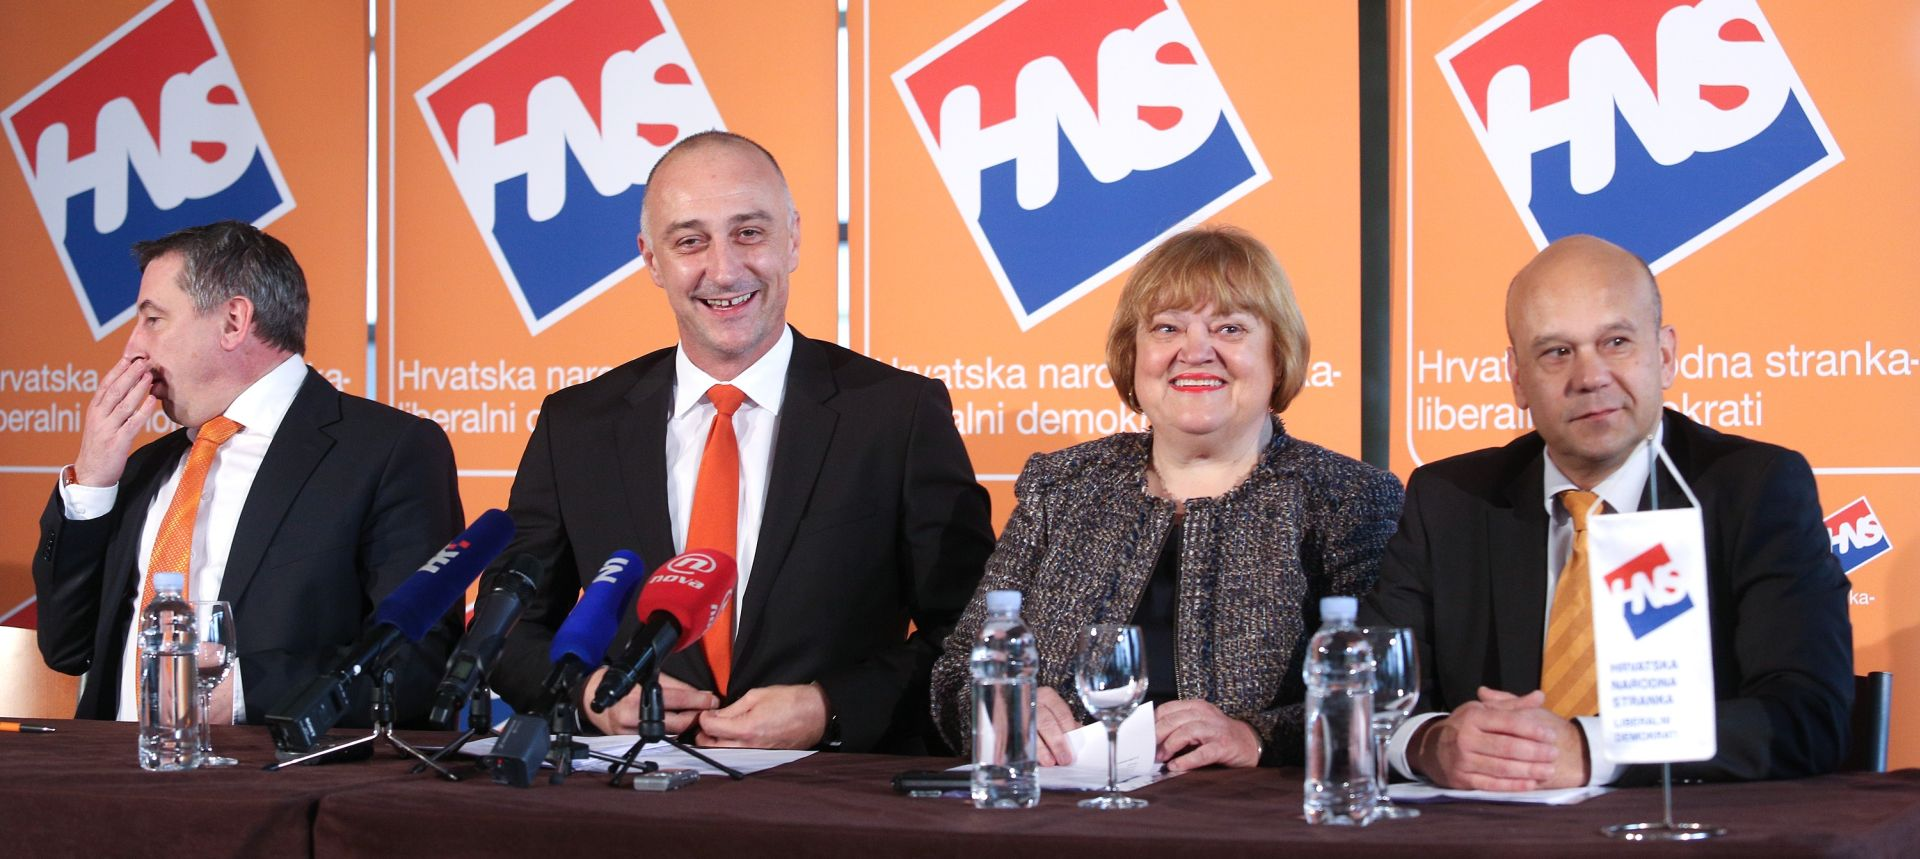 Kandidati za novo vodstvo HNS-a predstavljeni u Zagrebu